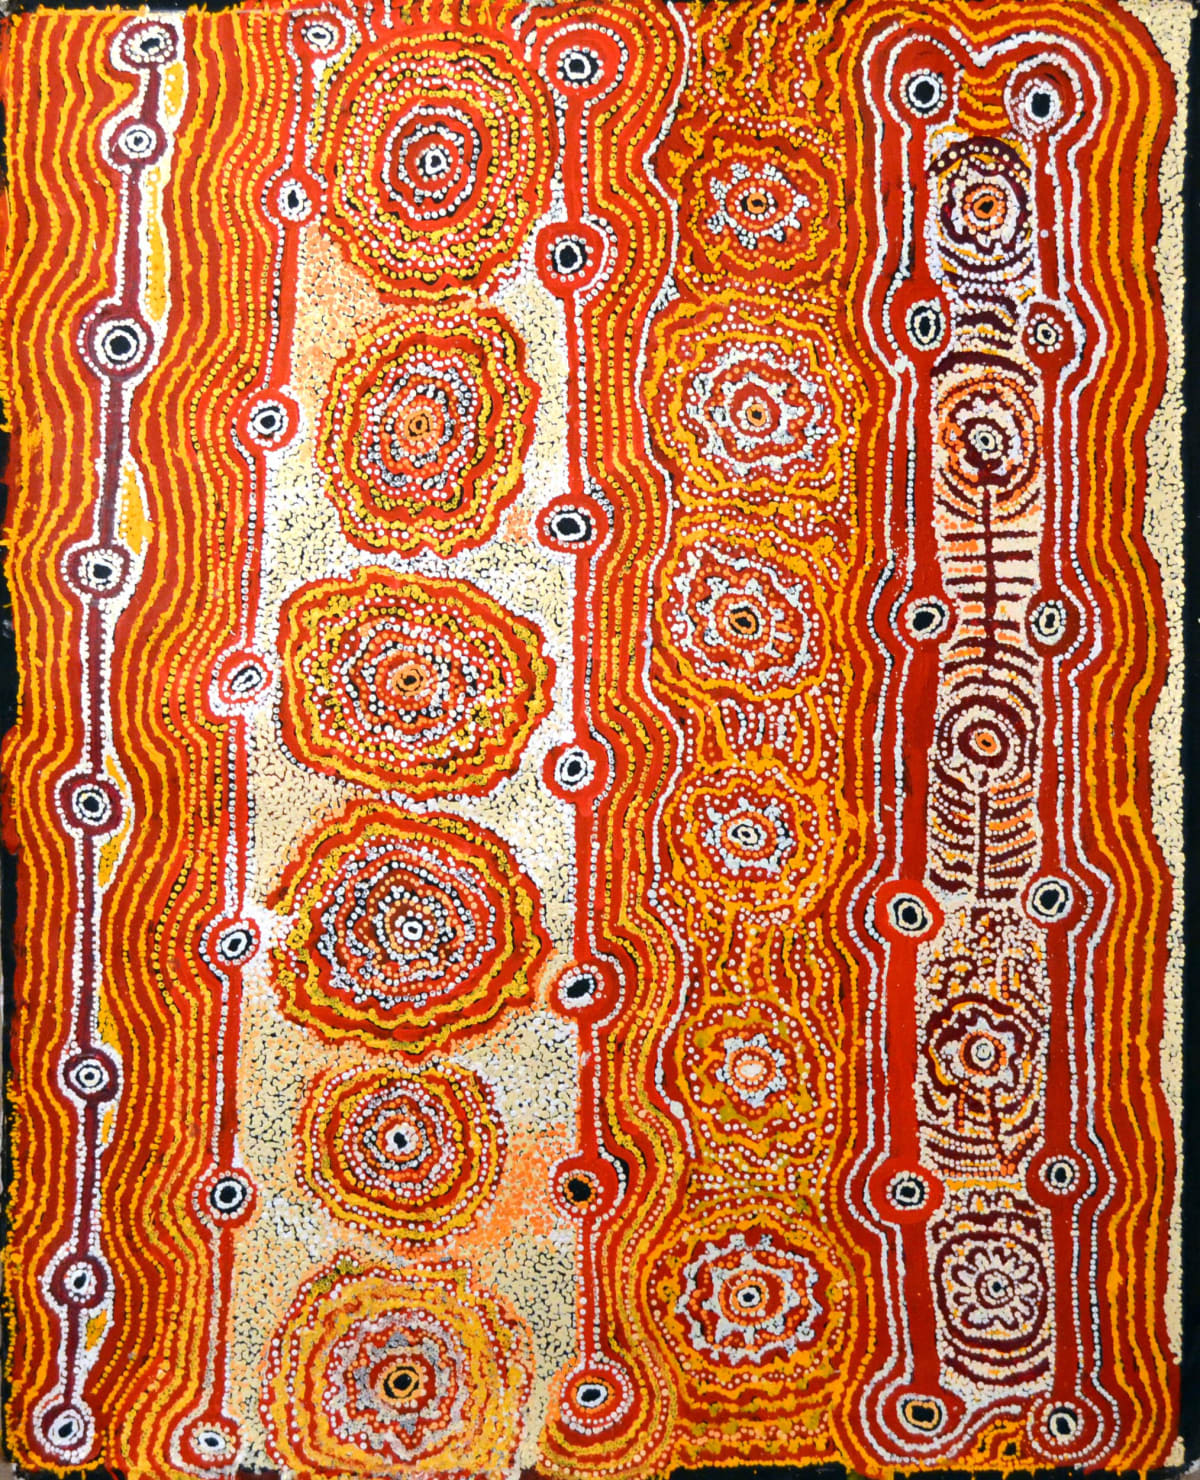 Hector Tjupuru Burton Anumara Tjukurpa acrylic on linen 122 x 101 cm